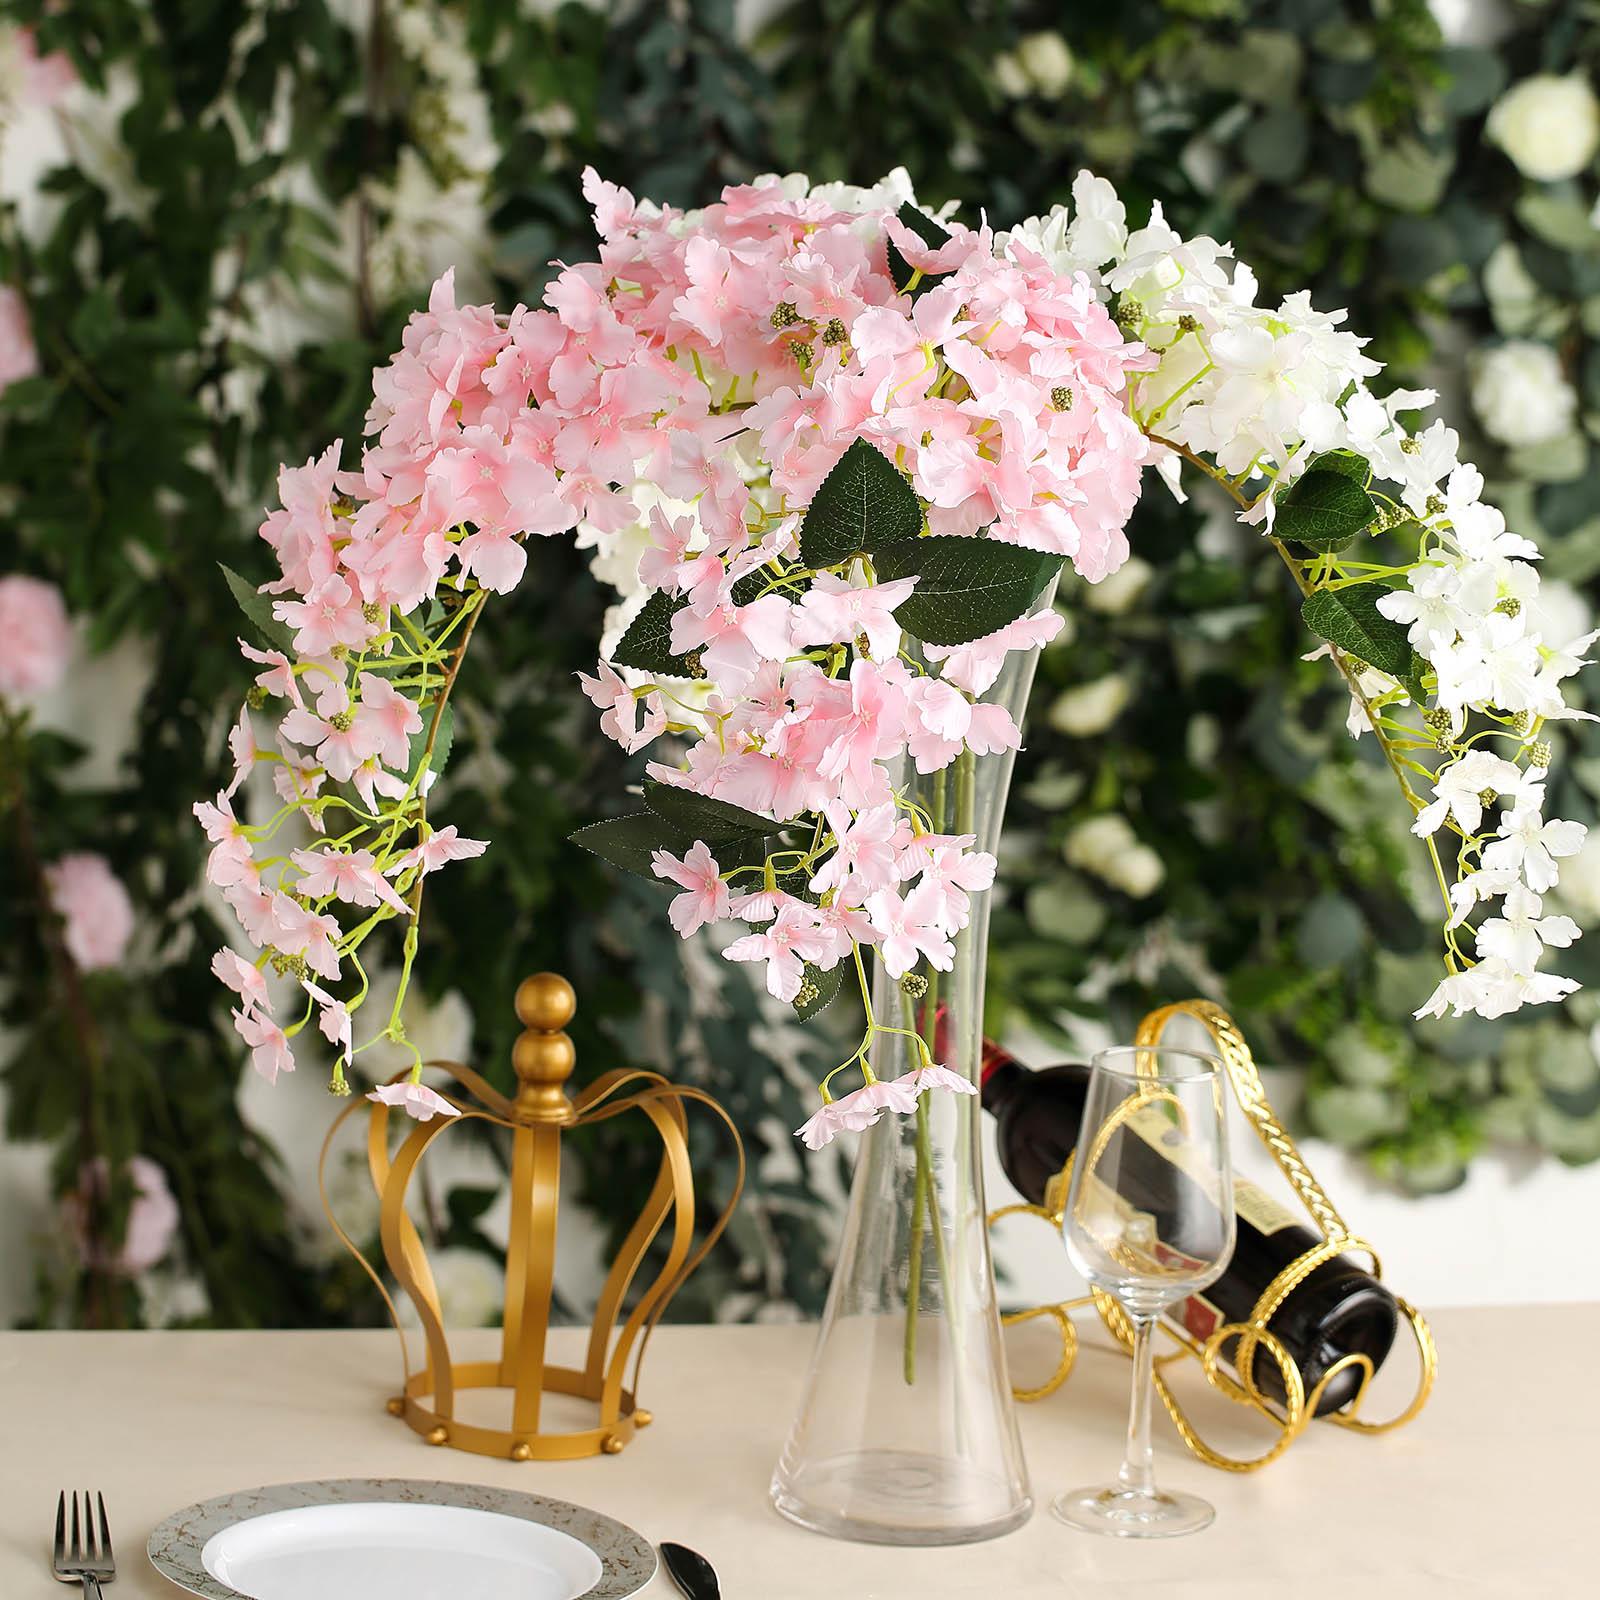 4 Stems 41 Tall Silk Hydrangea Artificial Flowers Wedding Party Centerpieces Ebay